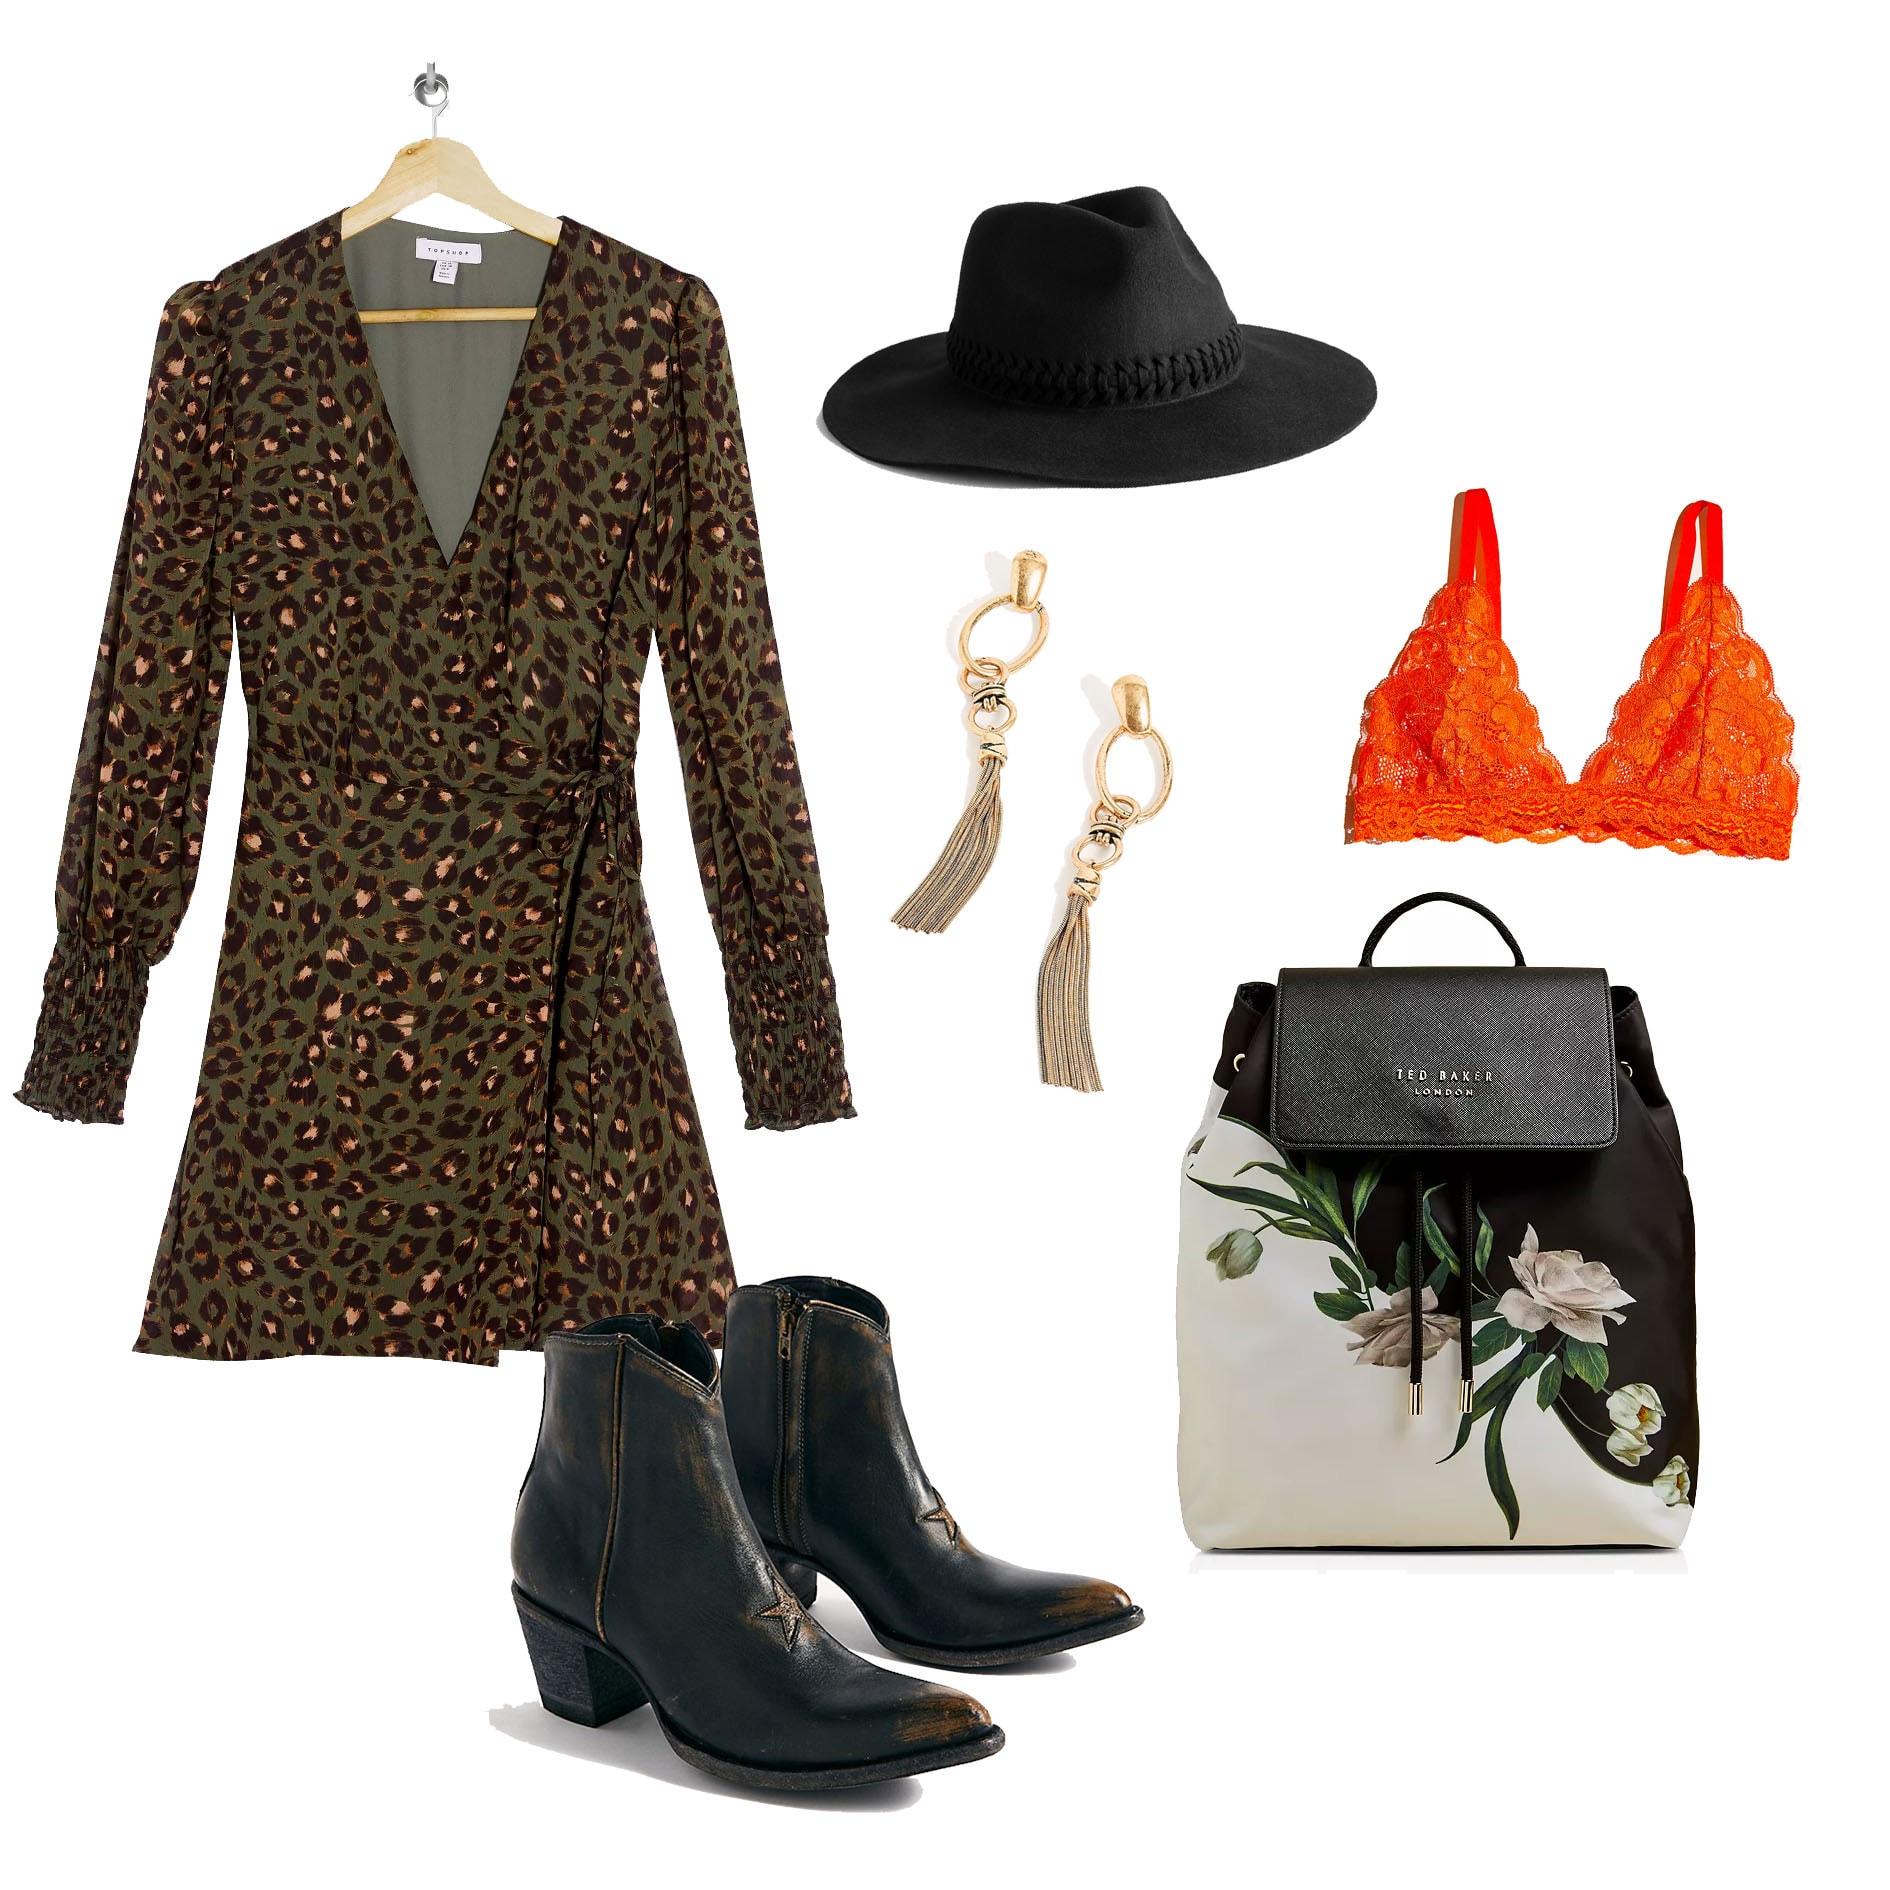 roupa de estampa animal de outono